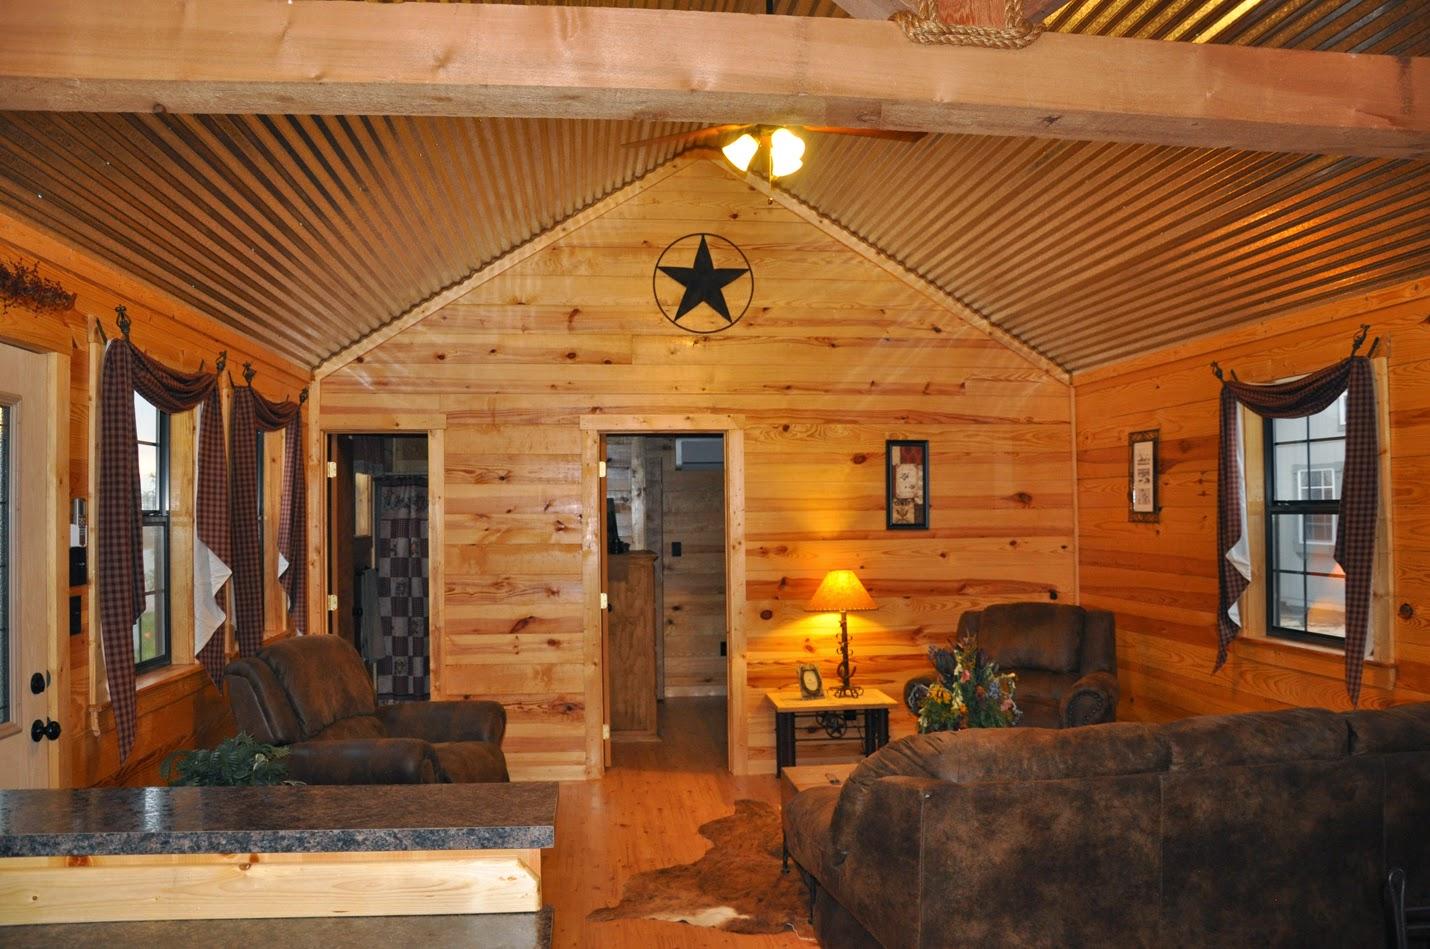 The All New Fantastic Lone Star Cabin 16 39 X 52 39 Portable